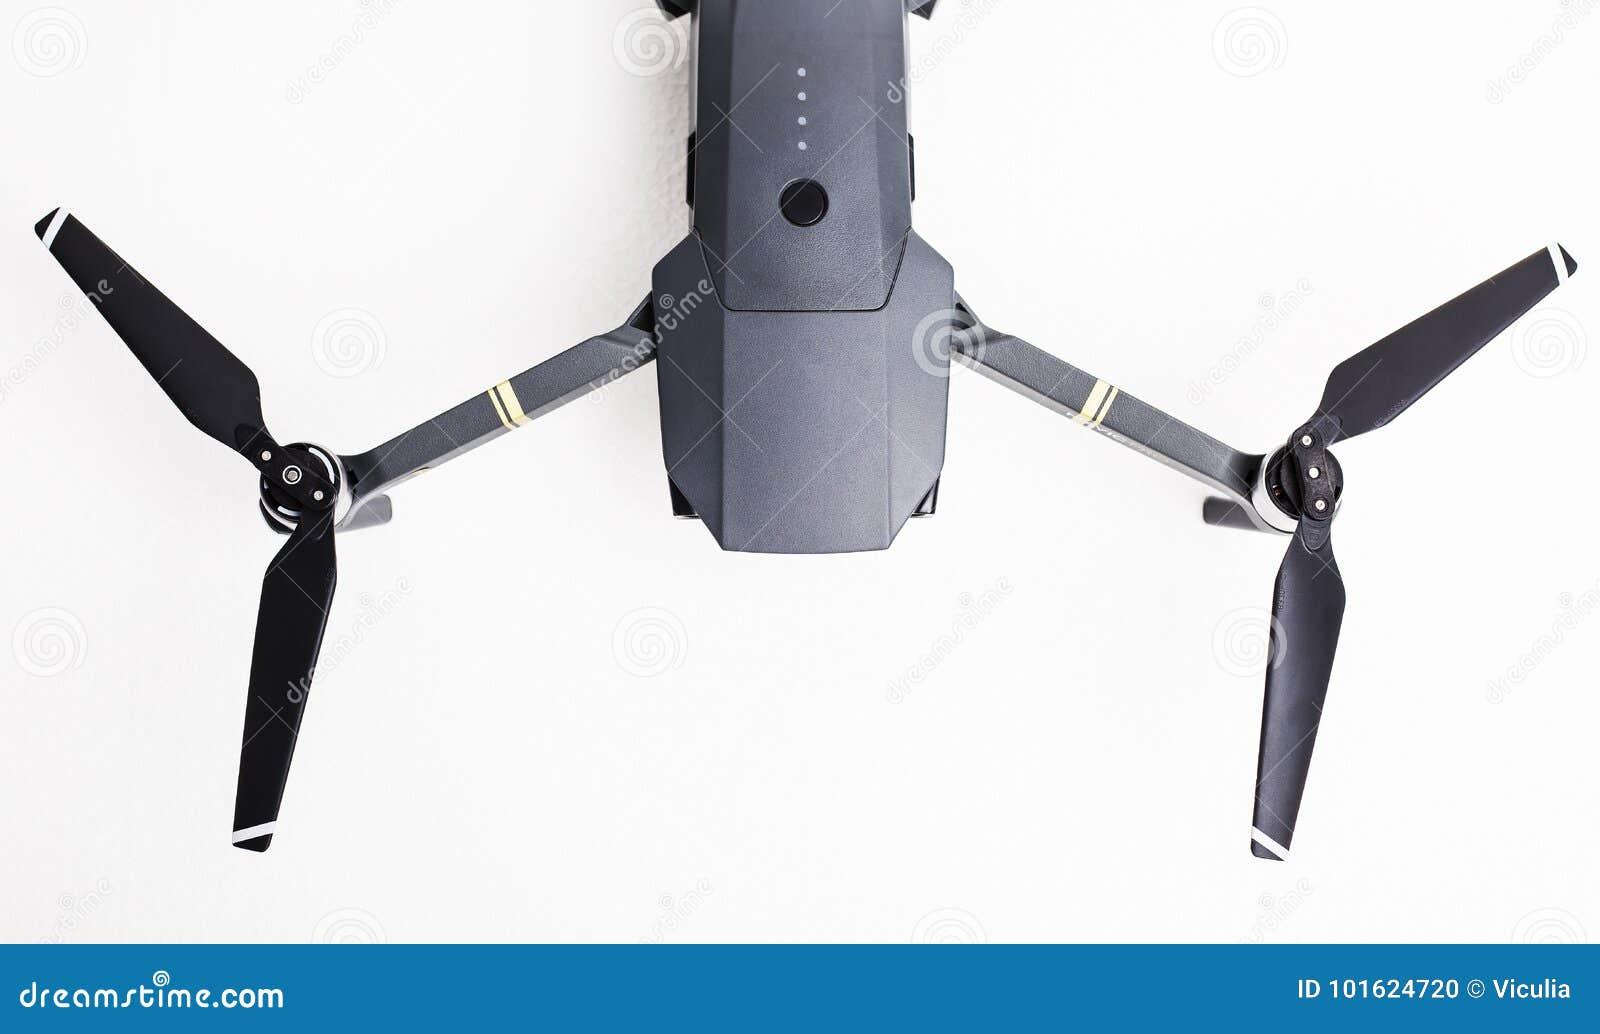 tracker gps drone